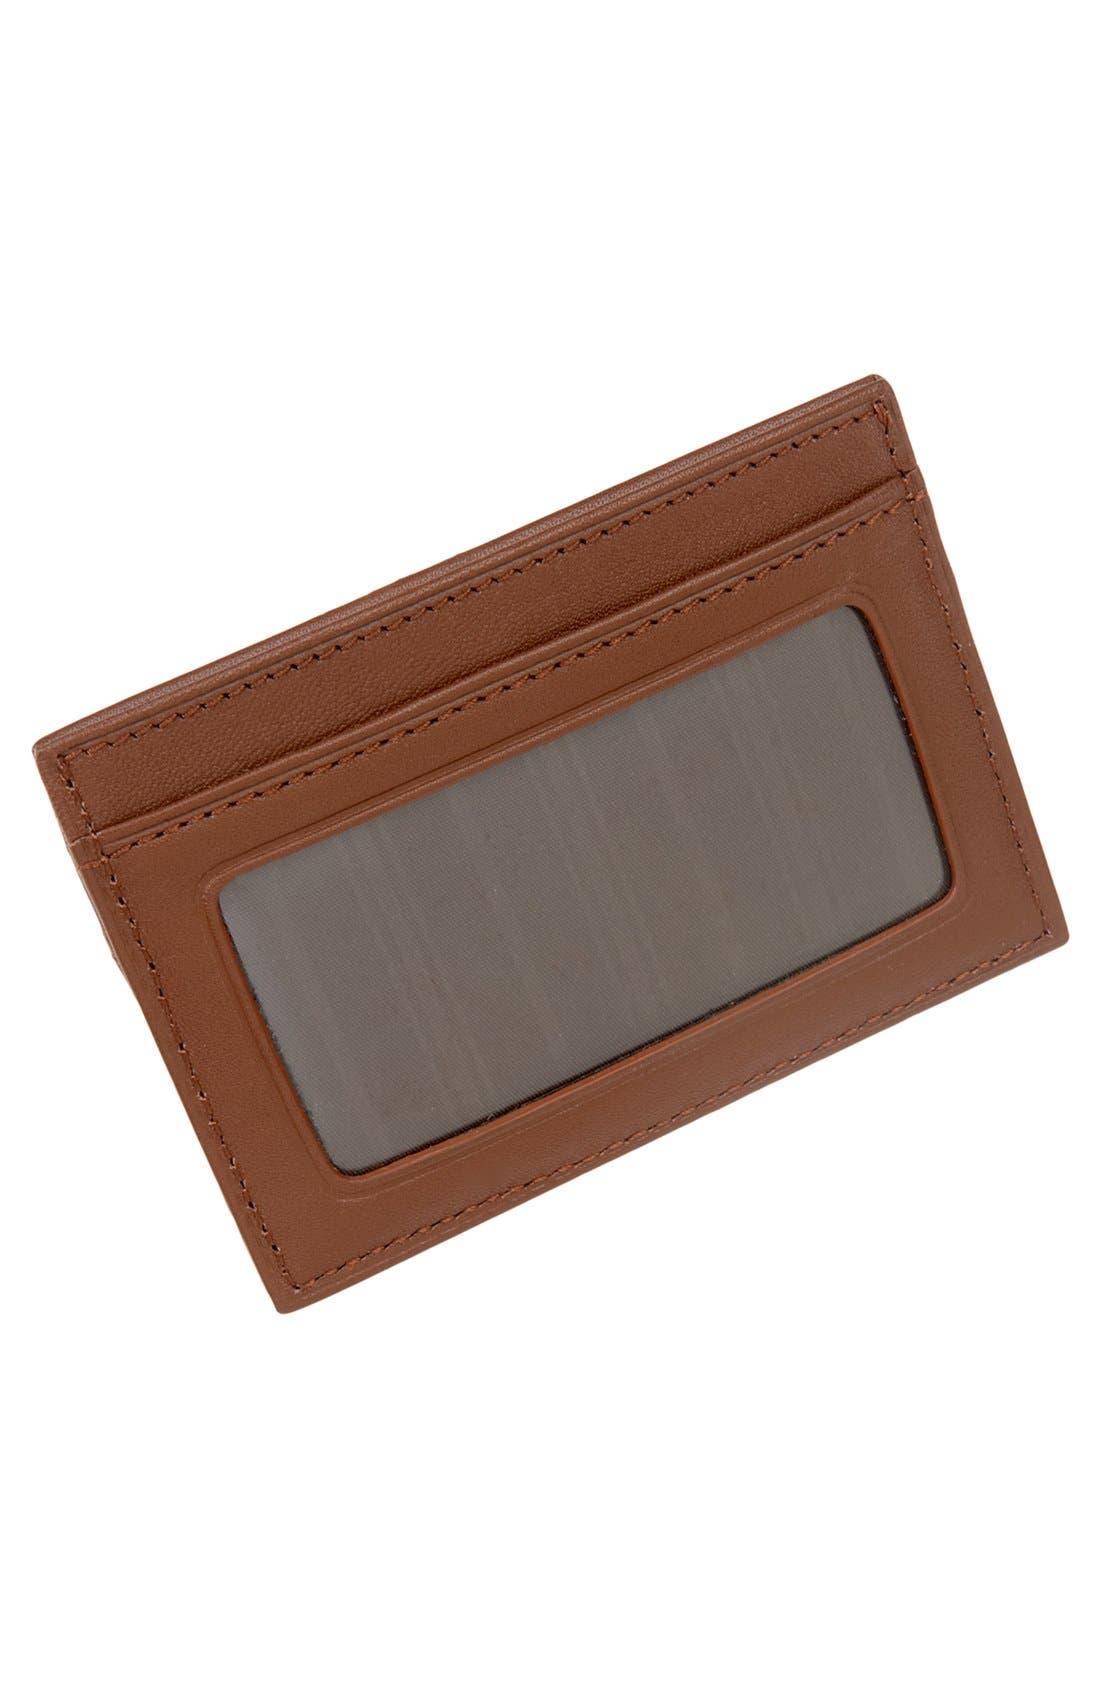 Alternate Image 2  - Tumi 'Slim' Card Case ID Wallet